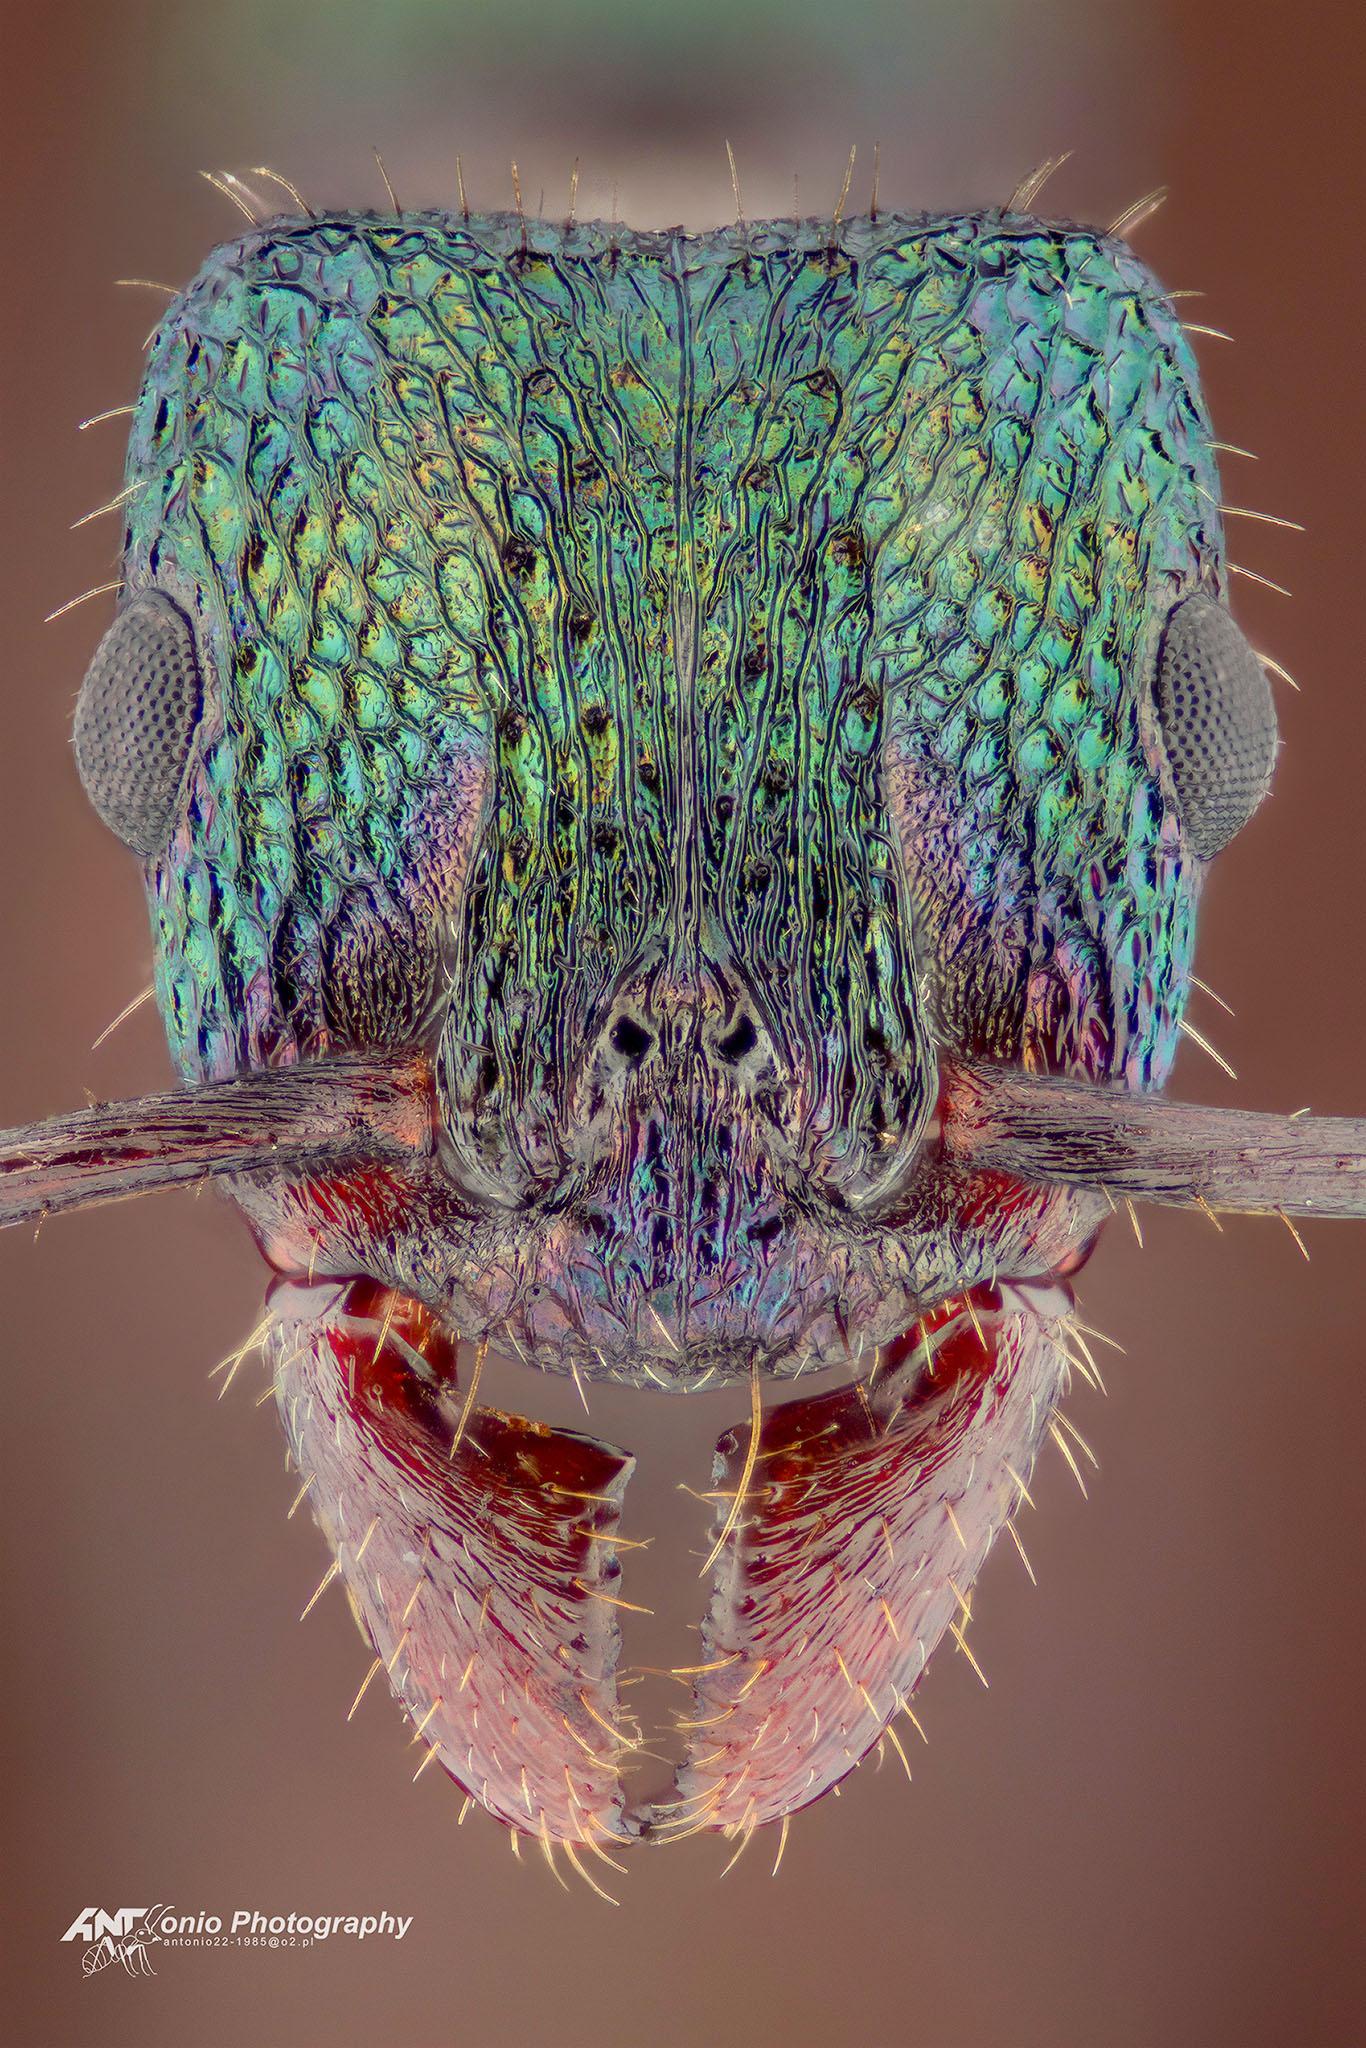 Ant Rhitidoponera metallica from Australia